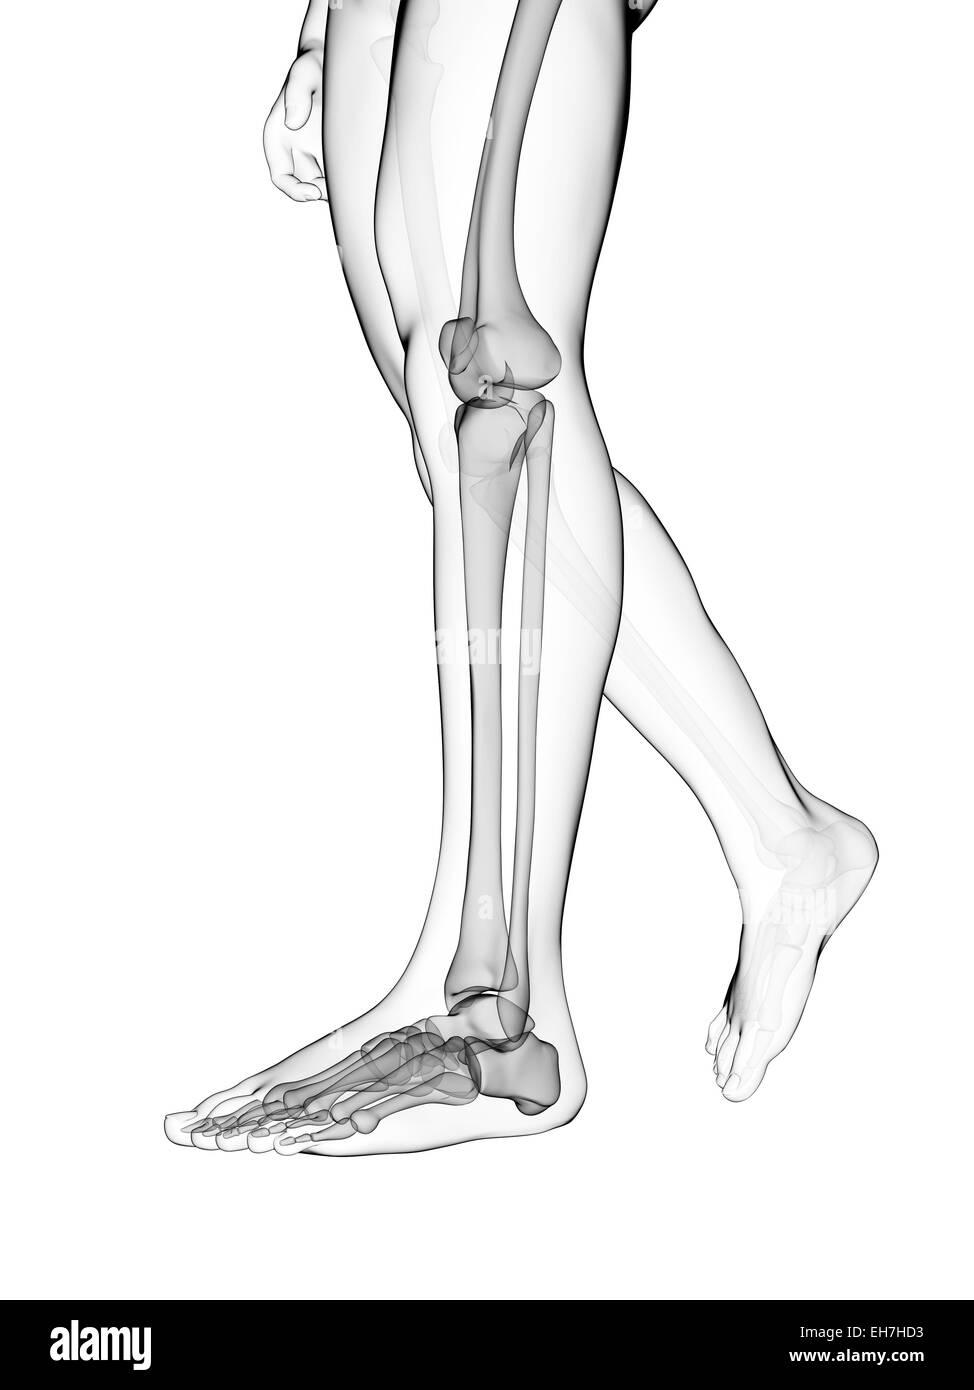 Human Leg Bones Illustration Stock Photo 79457983 Alamy